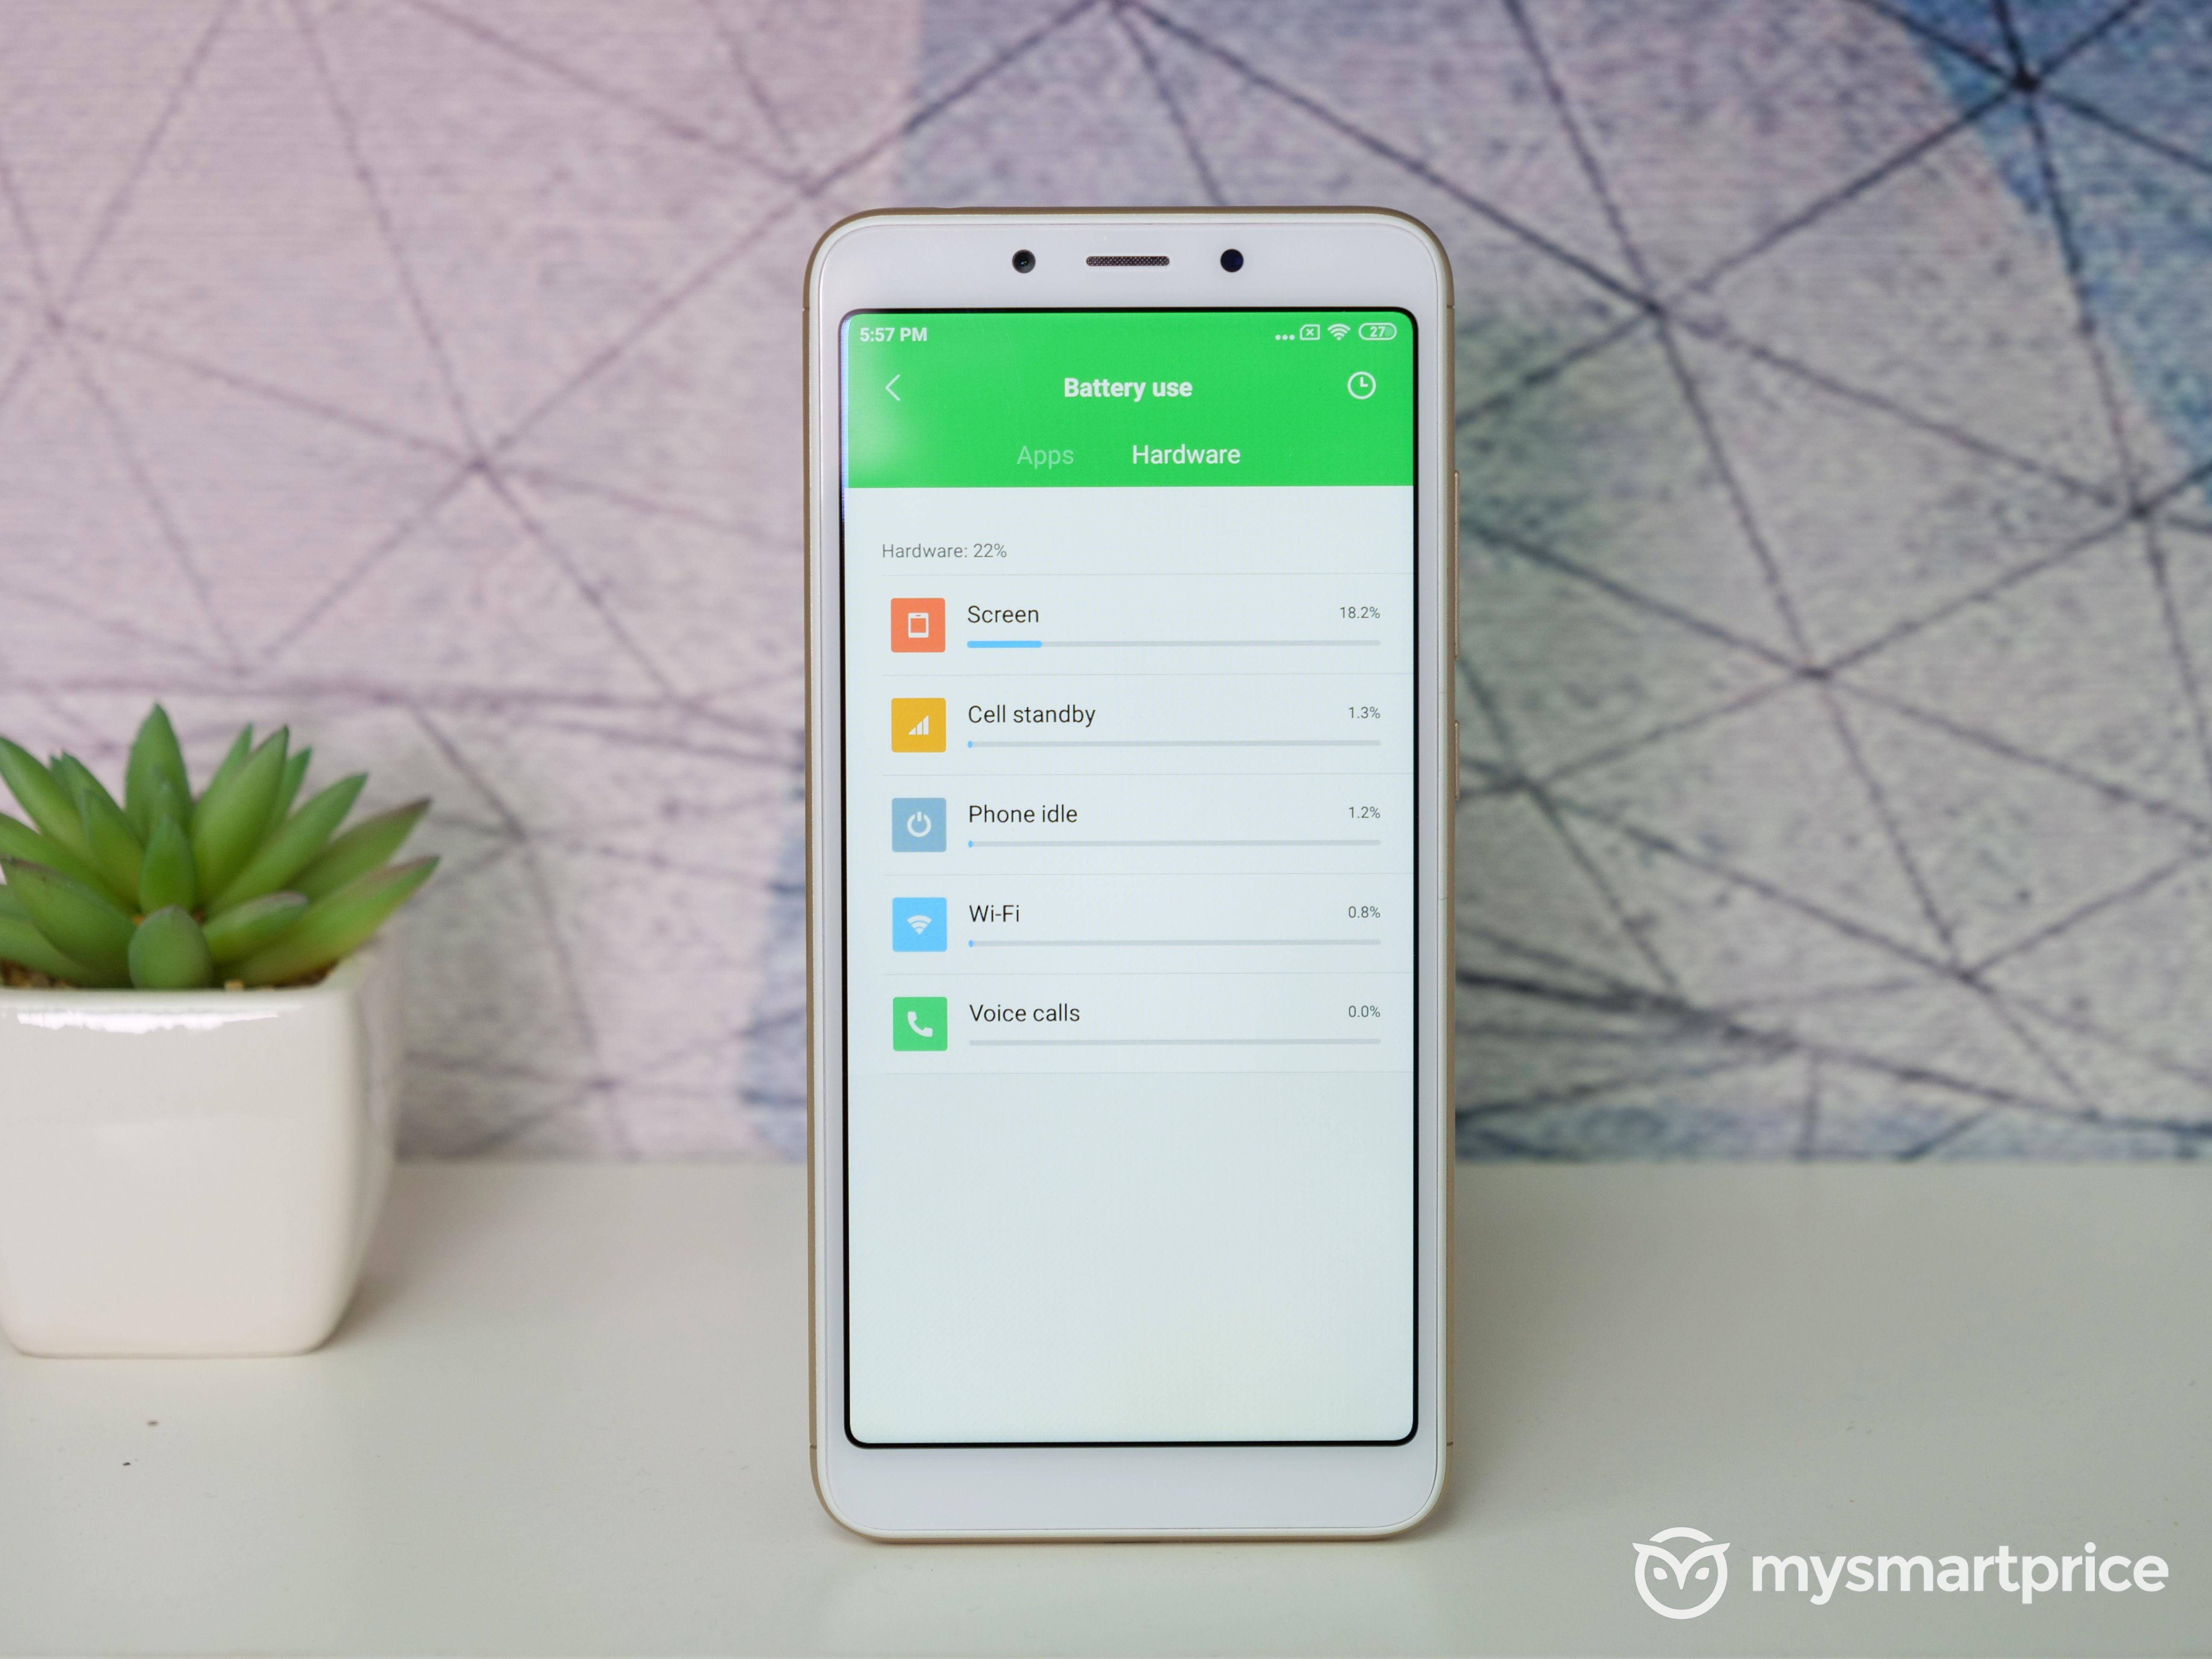 Xiaomi Redmi 6 Review: A Step Down From The Redmi 5 - MySmartPrice